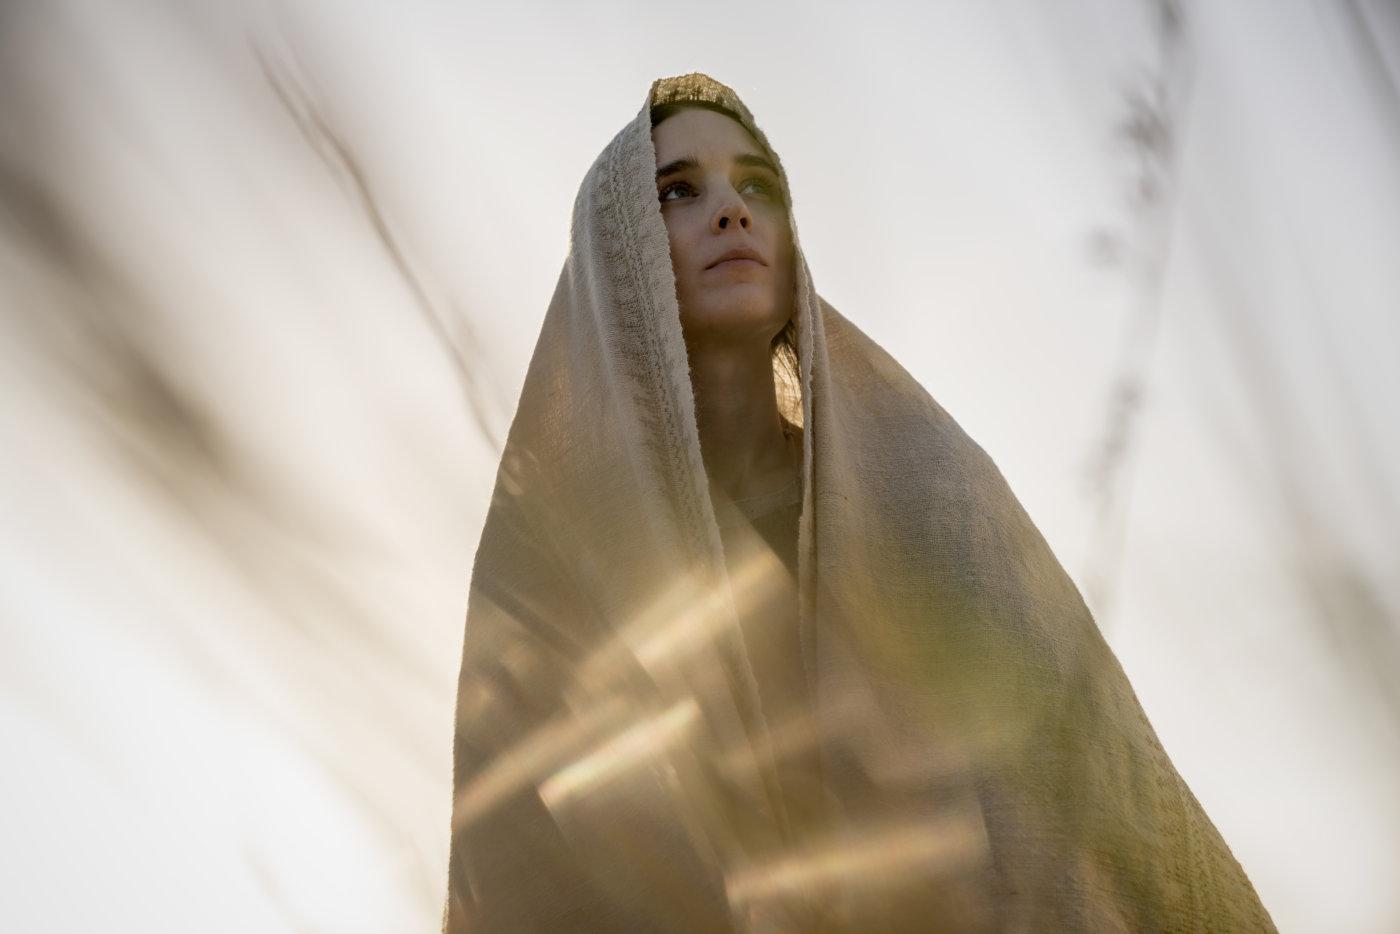 Maria Magdalena Rooney Mara